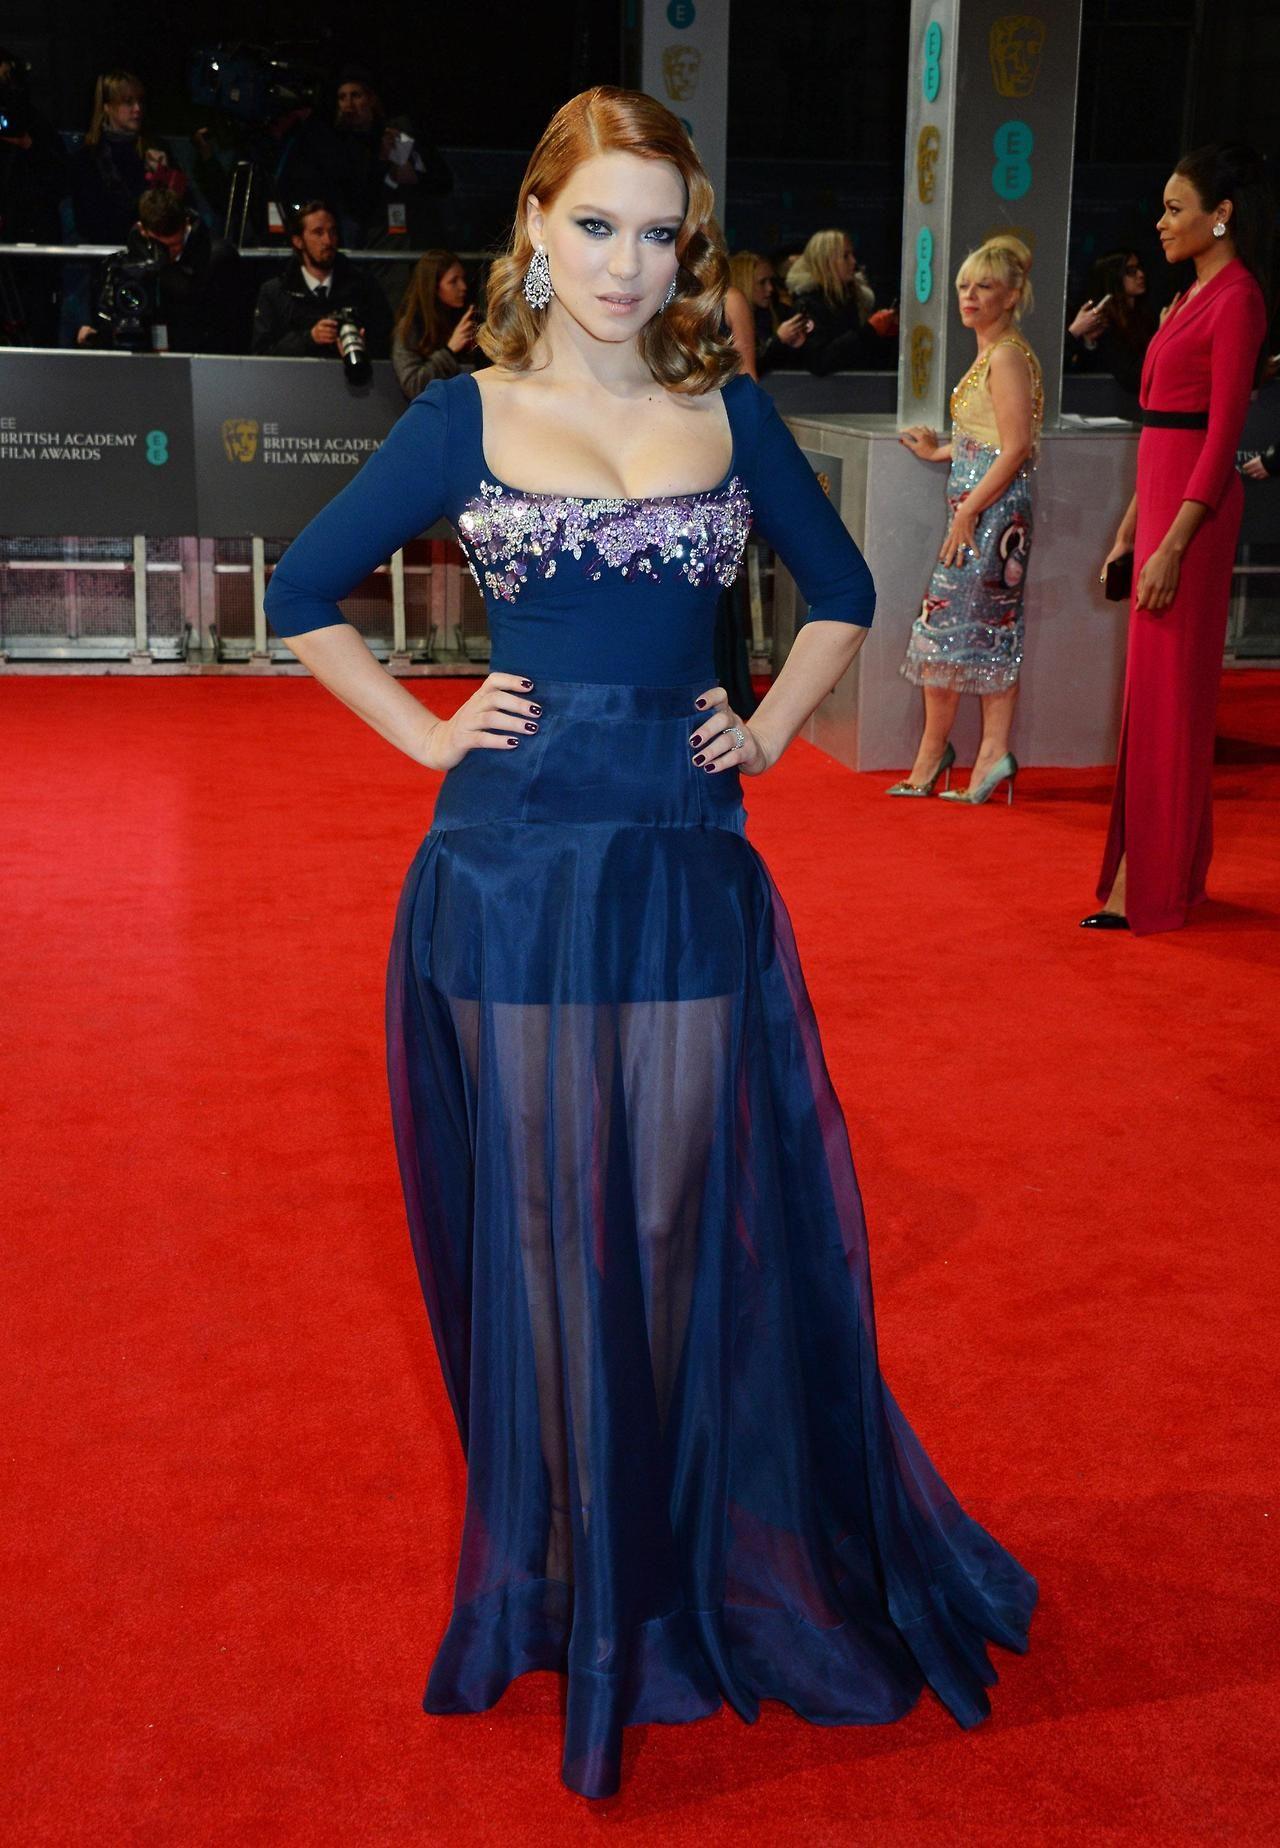 Discount Oscar Red Carpet Gowns - dhgate.com